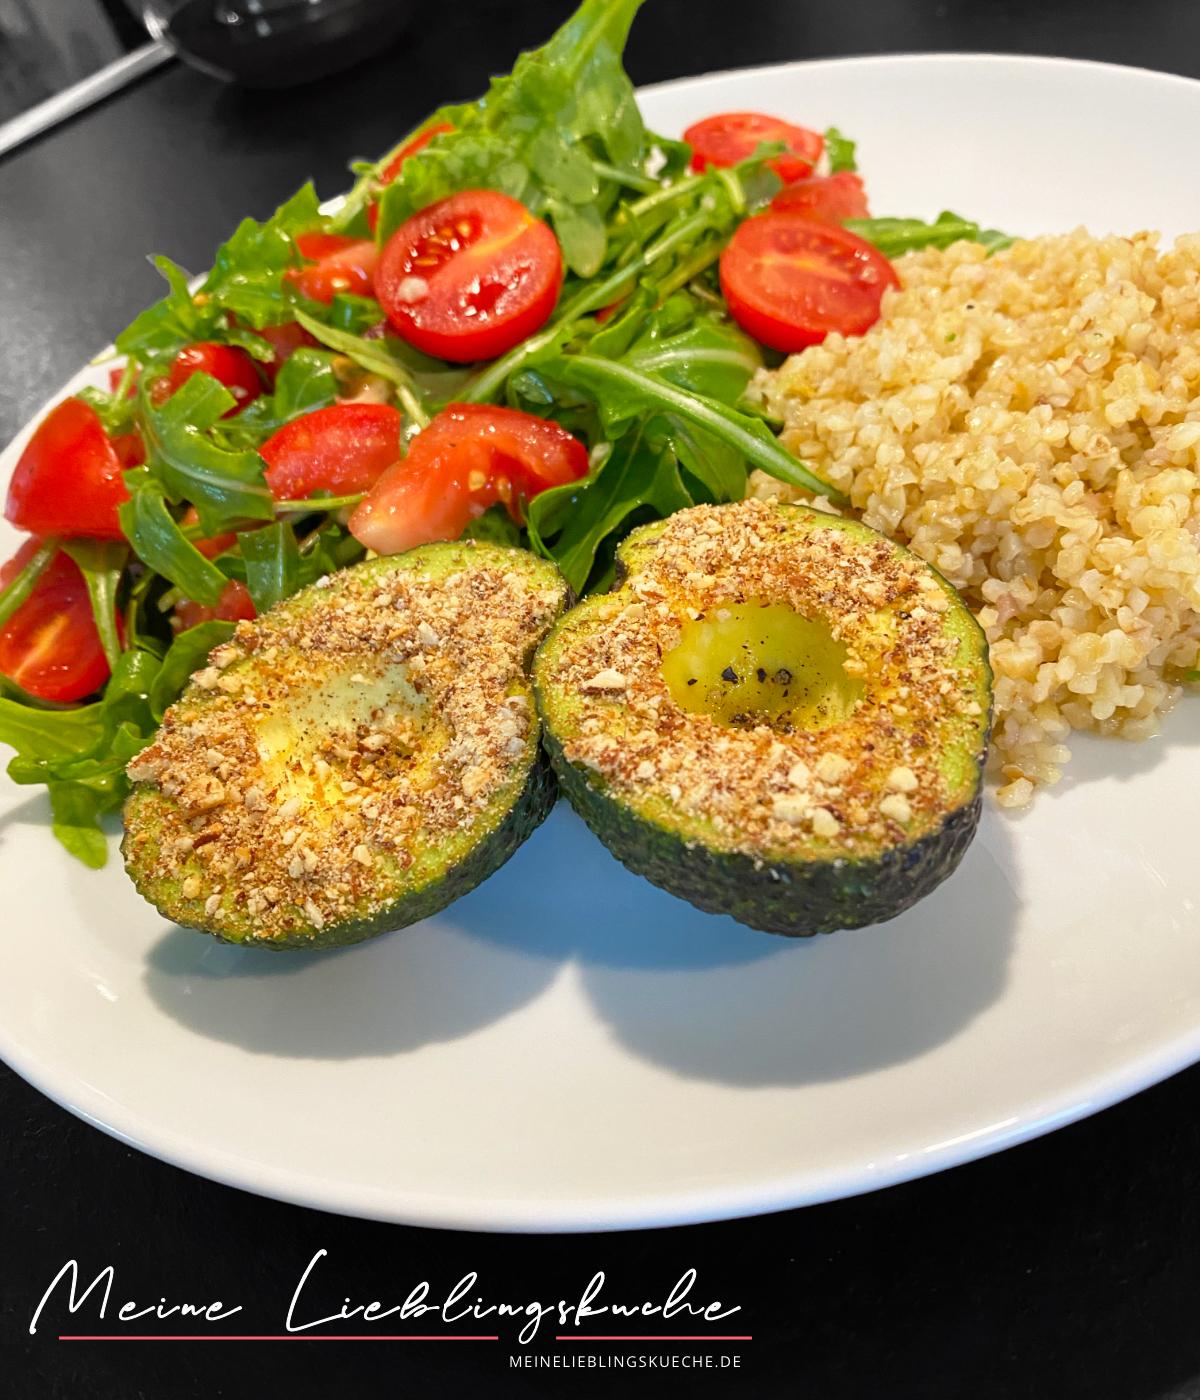 Rucola-Tomaten-Salat mit Bulgur und Avocado